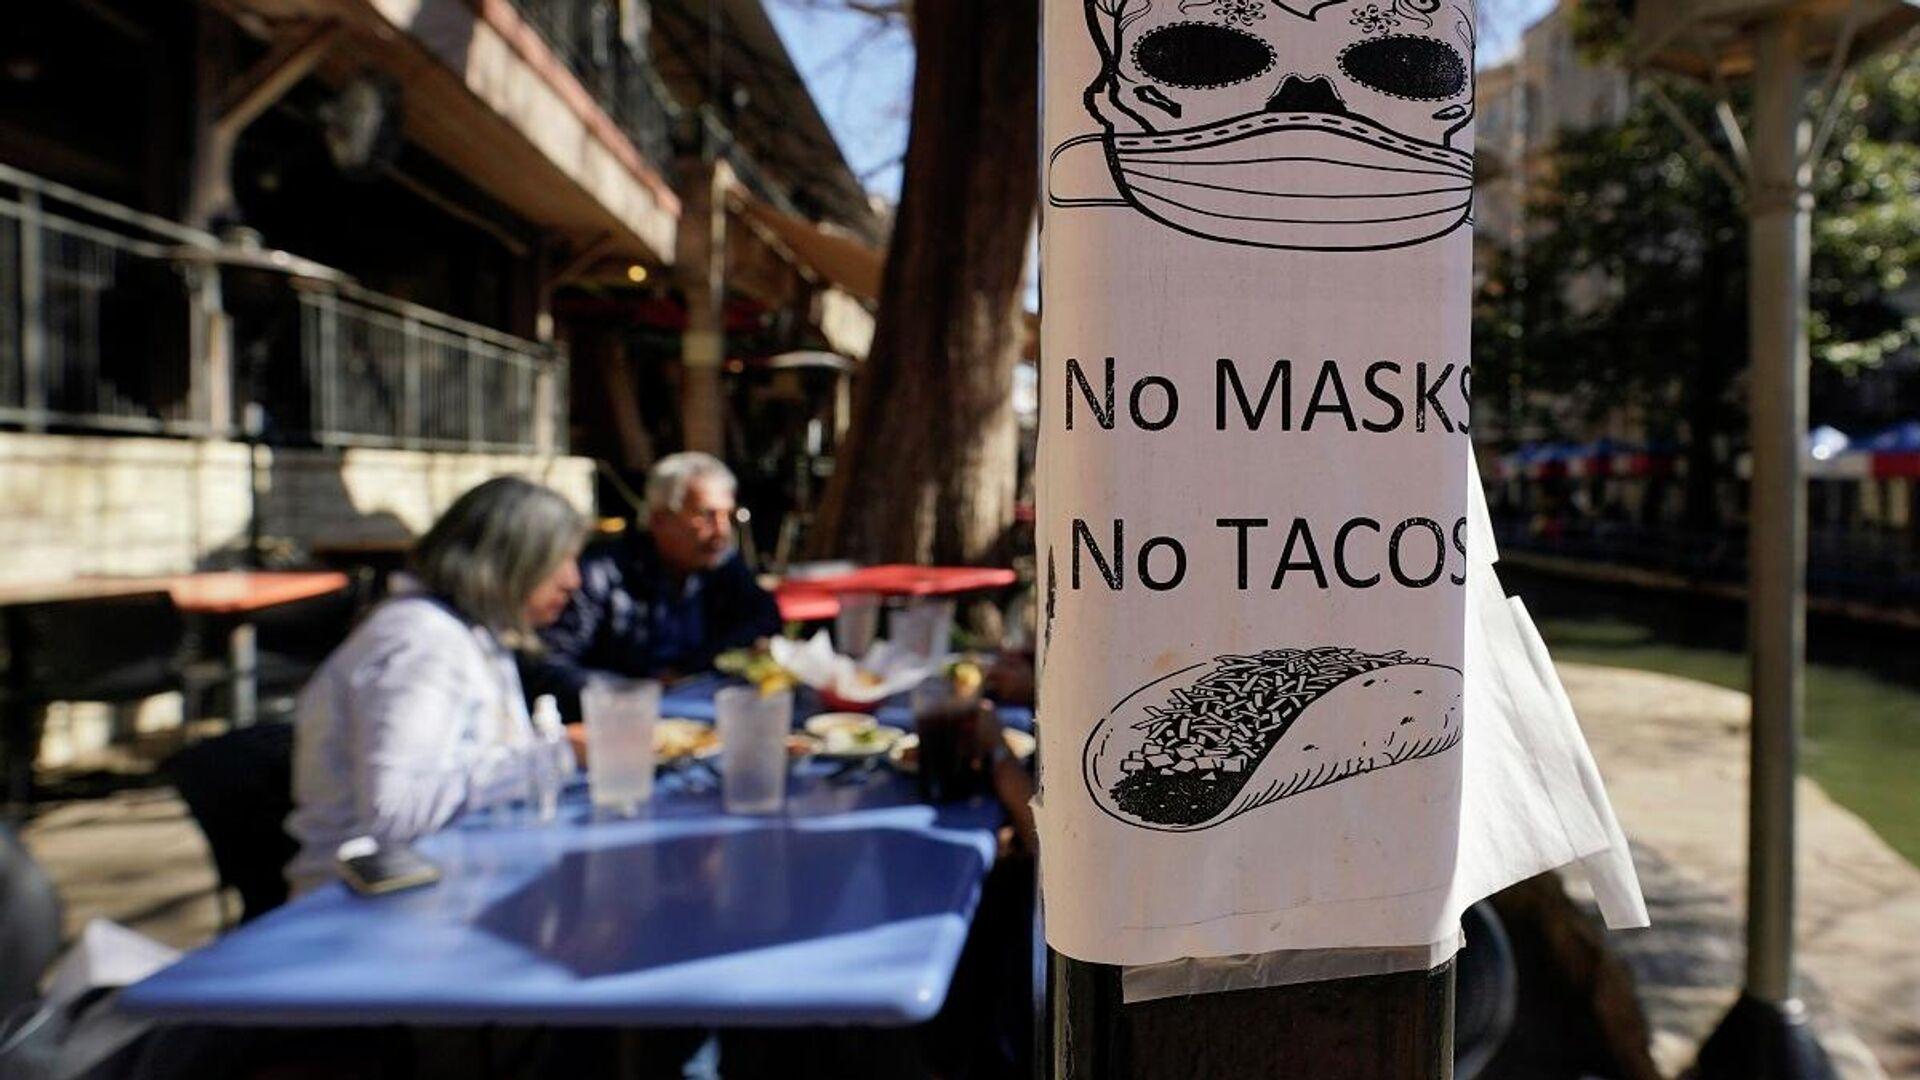 Un cartel que insta a los clientes que se pongan la mascarilla en un comedor - Sputnik Mundo, 1920, 04.03.2021